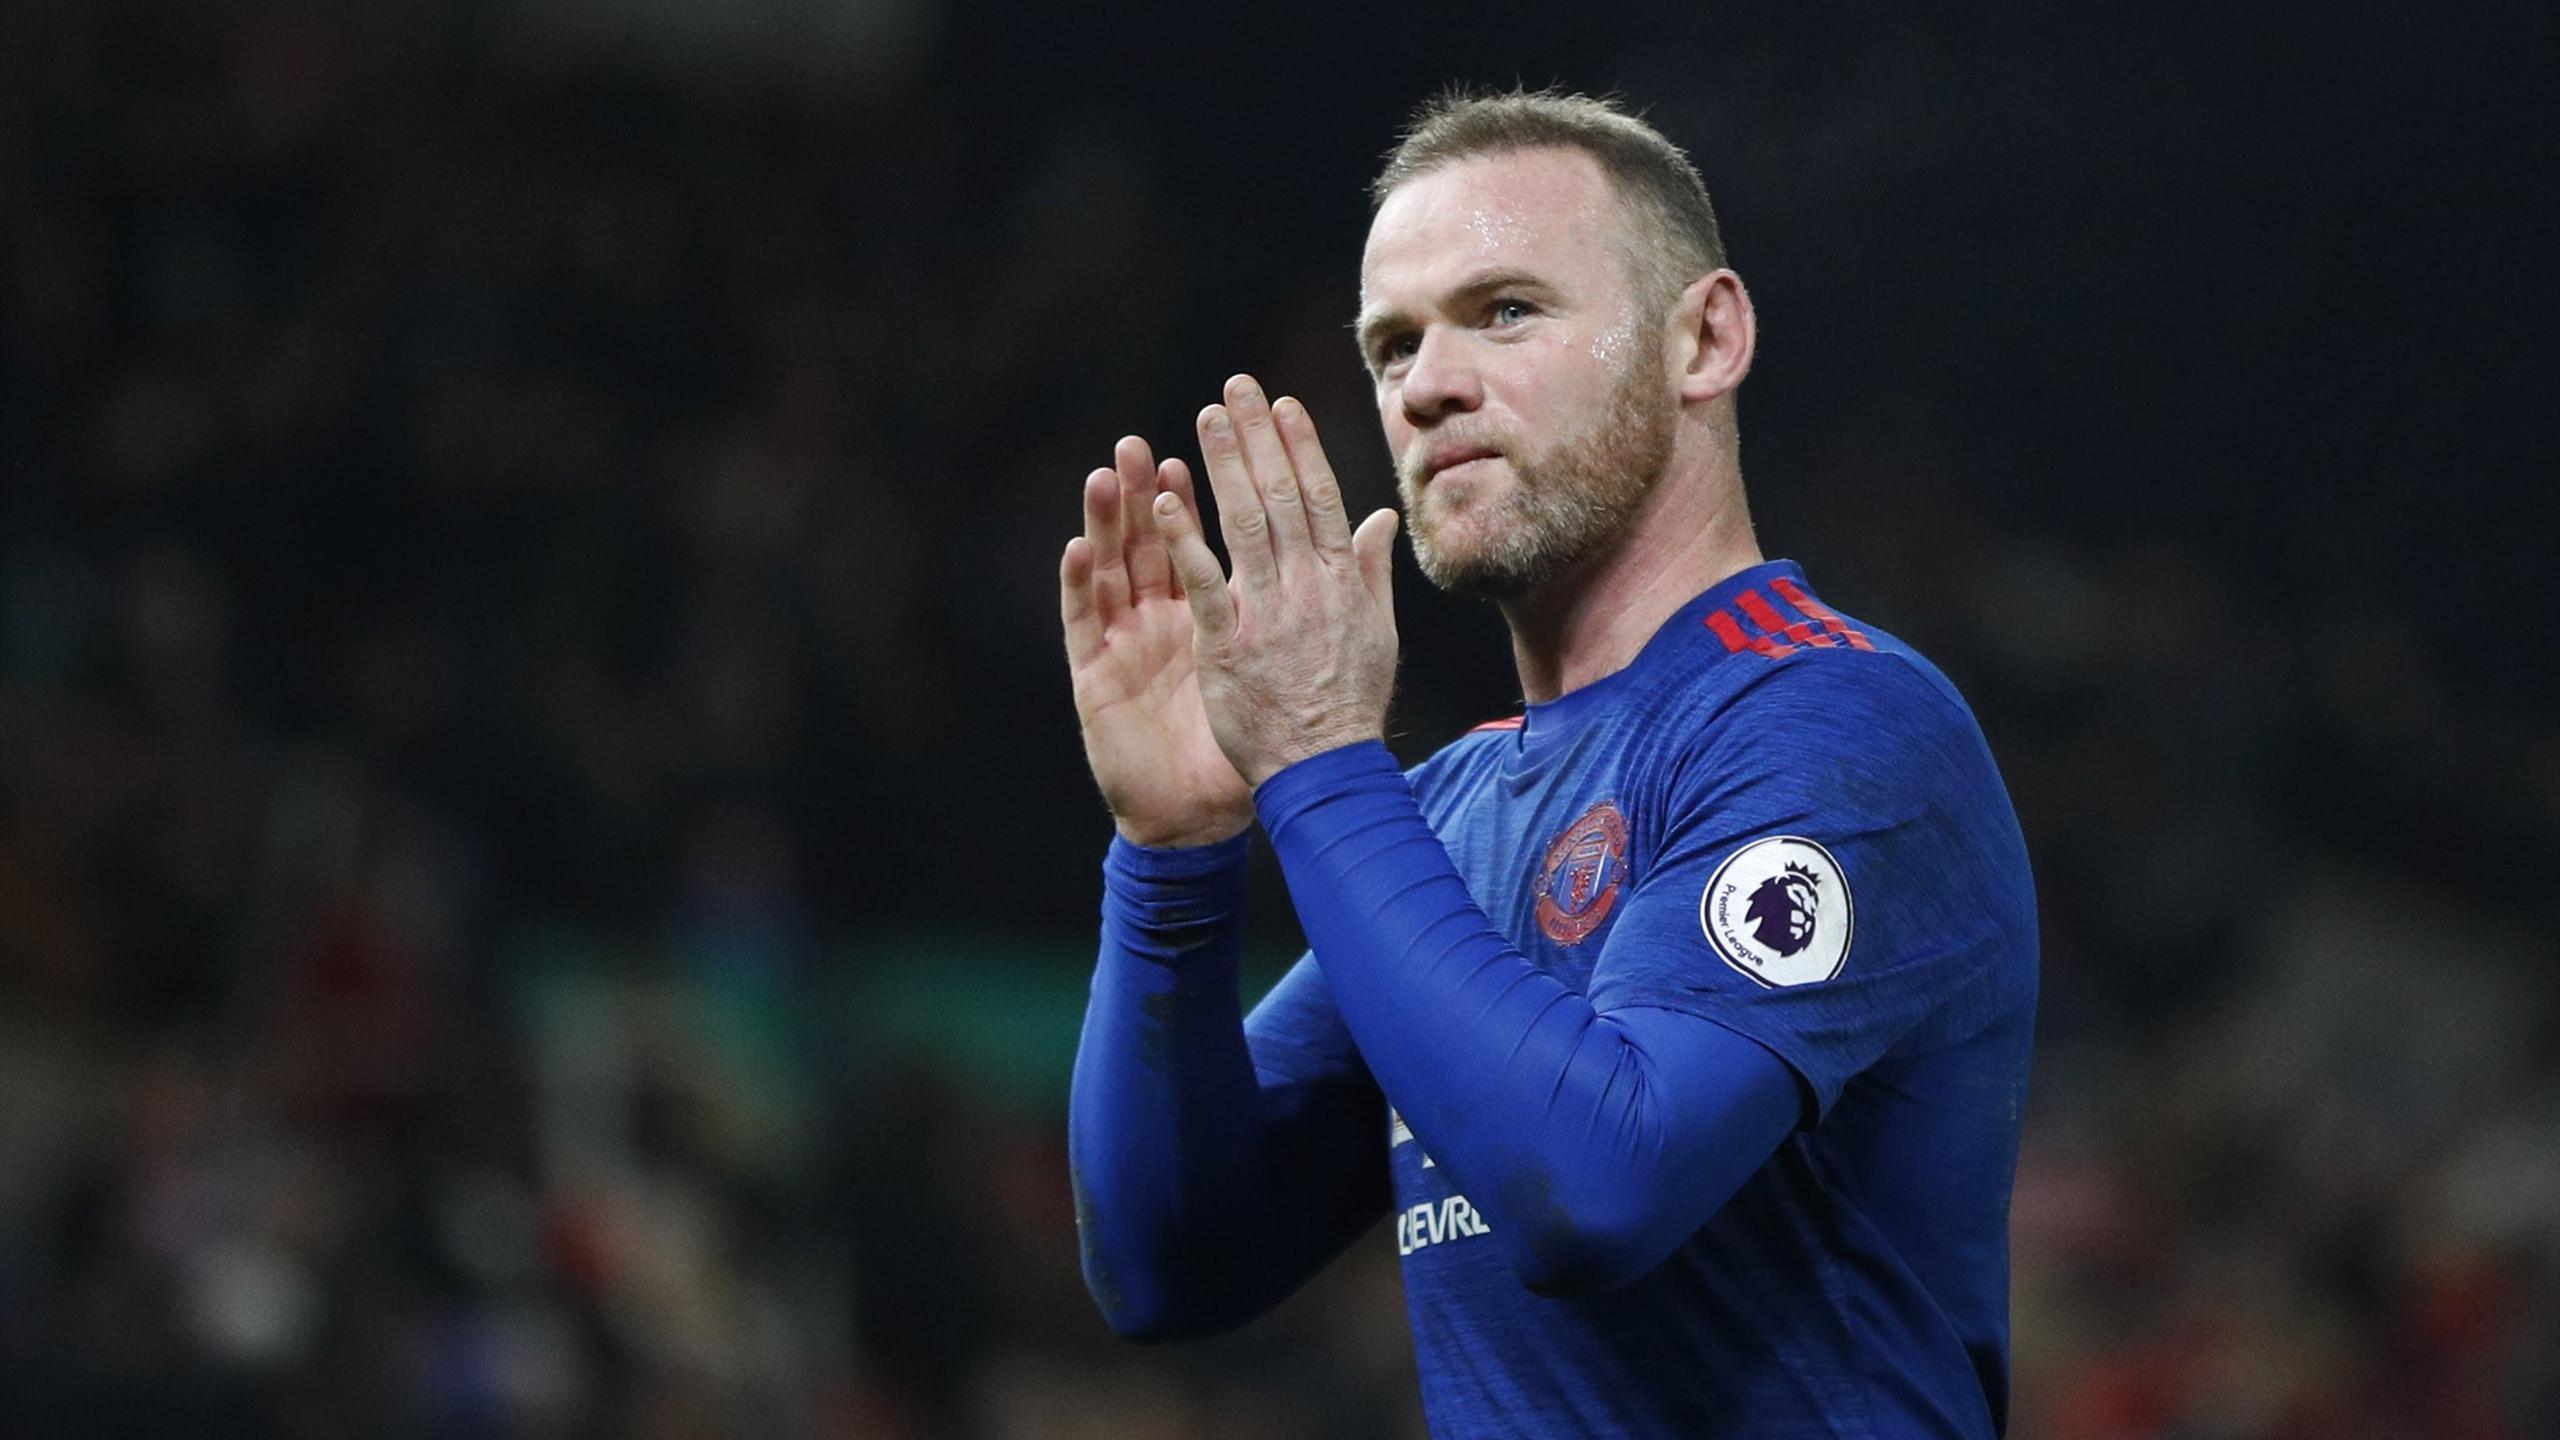 Manchester United's Wayne Rooney applauds fans